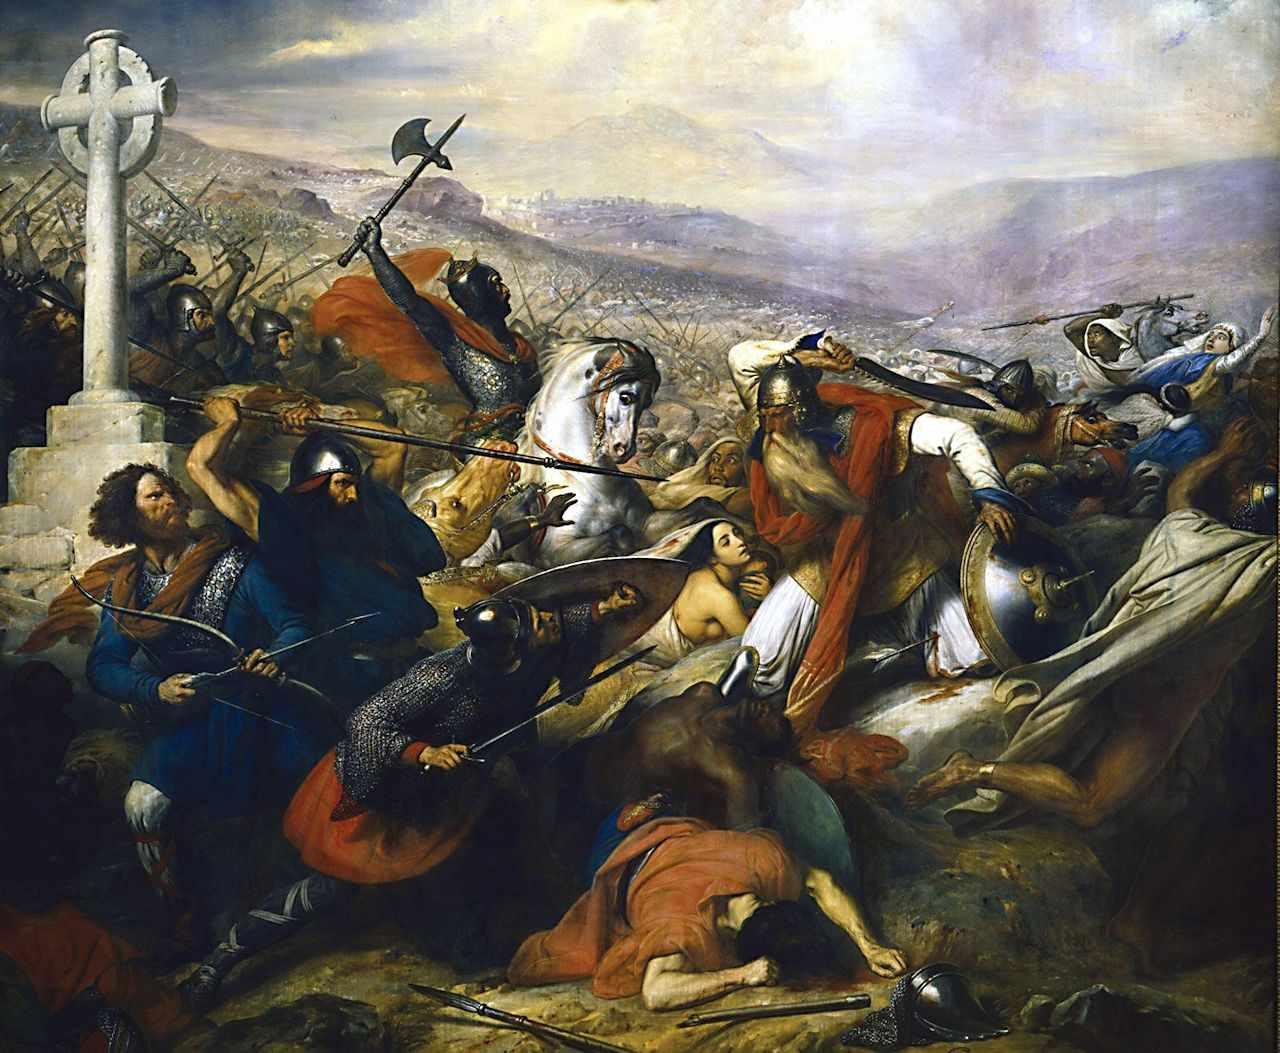 Carlos Martel em Poitiers. Charles de Steuben (1788-1856). Museu de Versailles